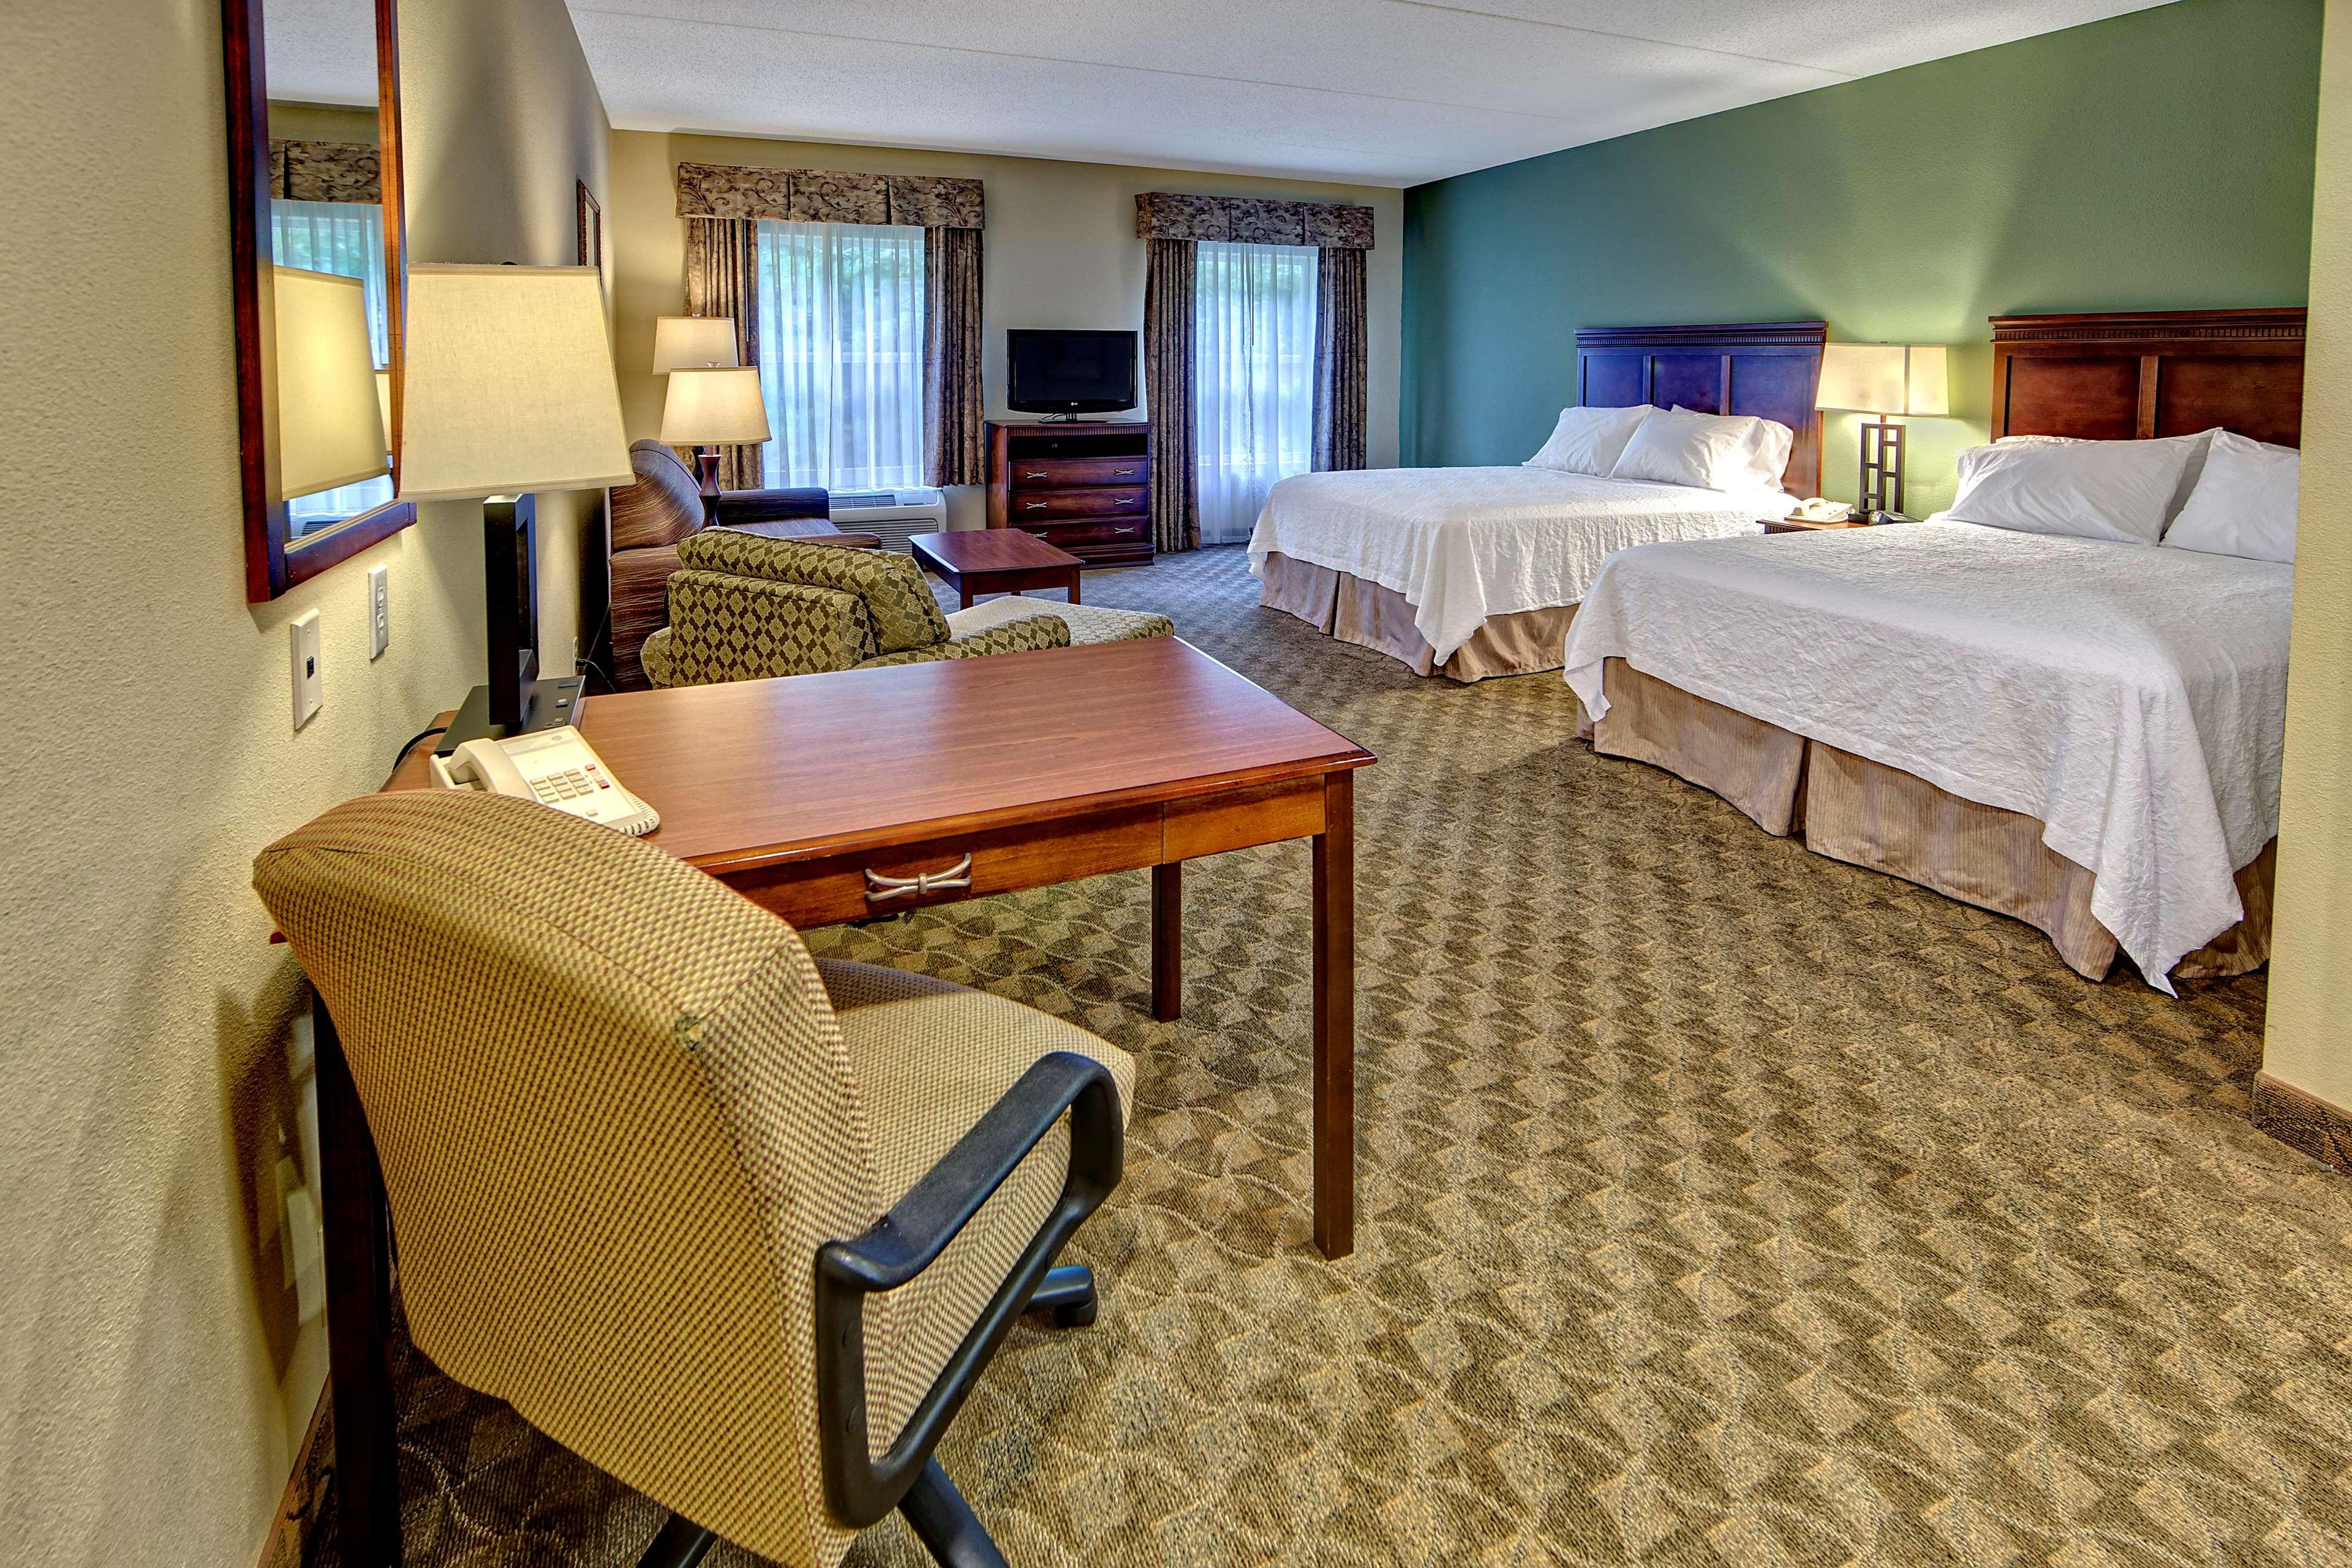 Hampton Inn & Suites Cashiers-Sapphire Valley image 35